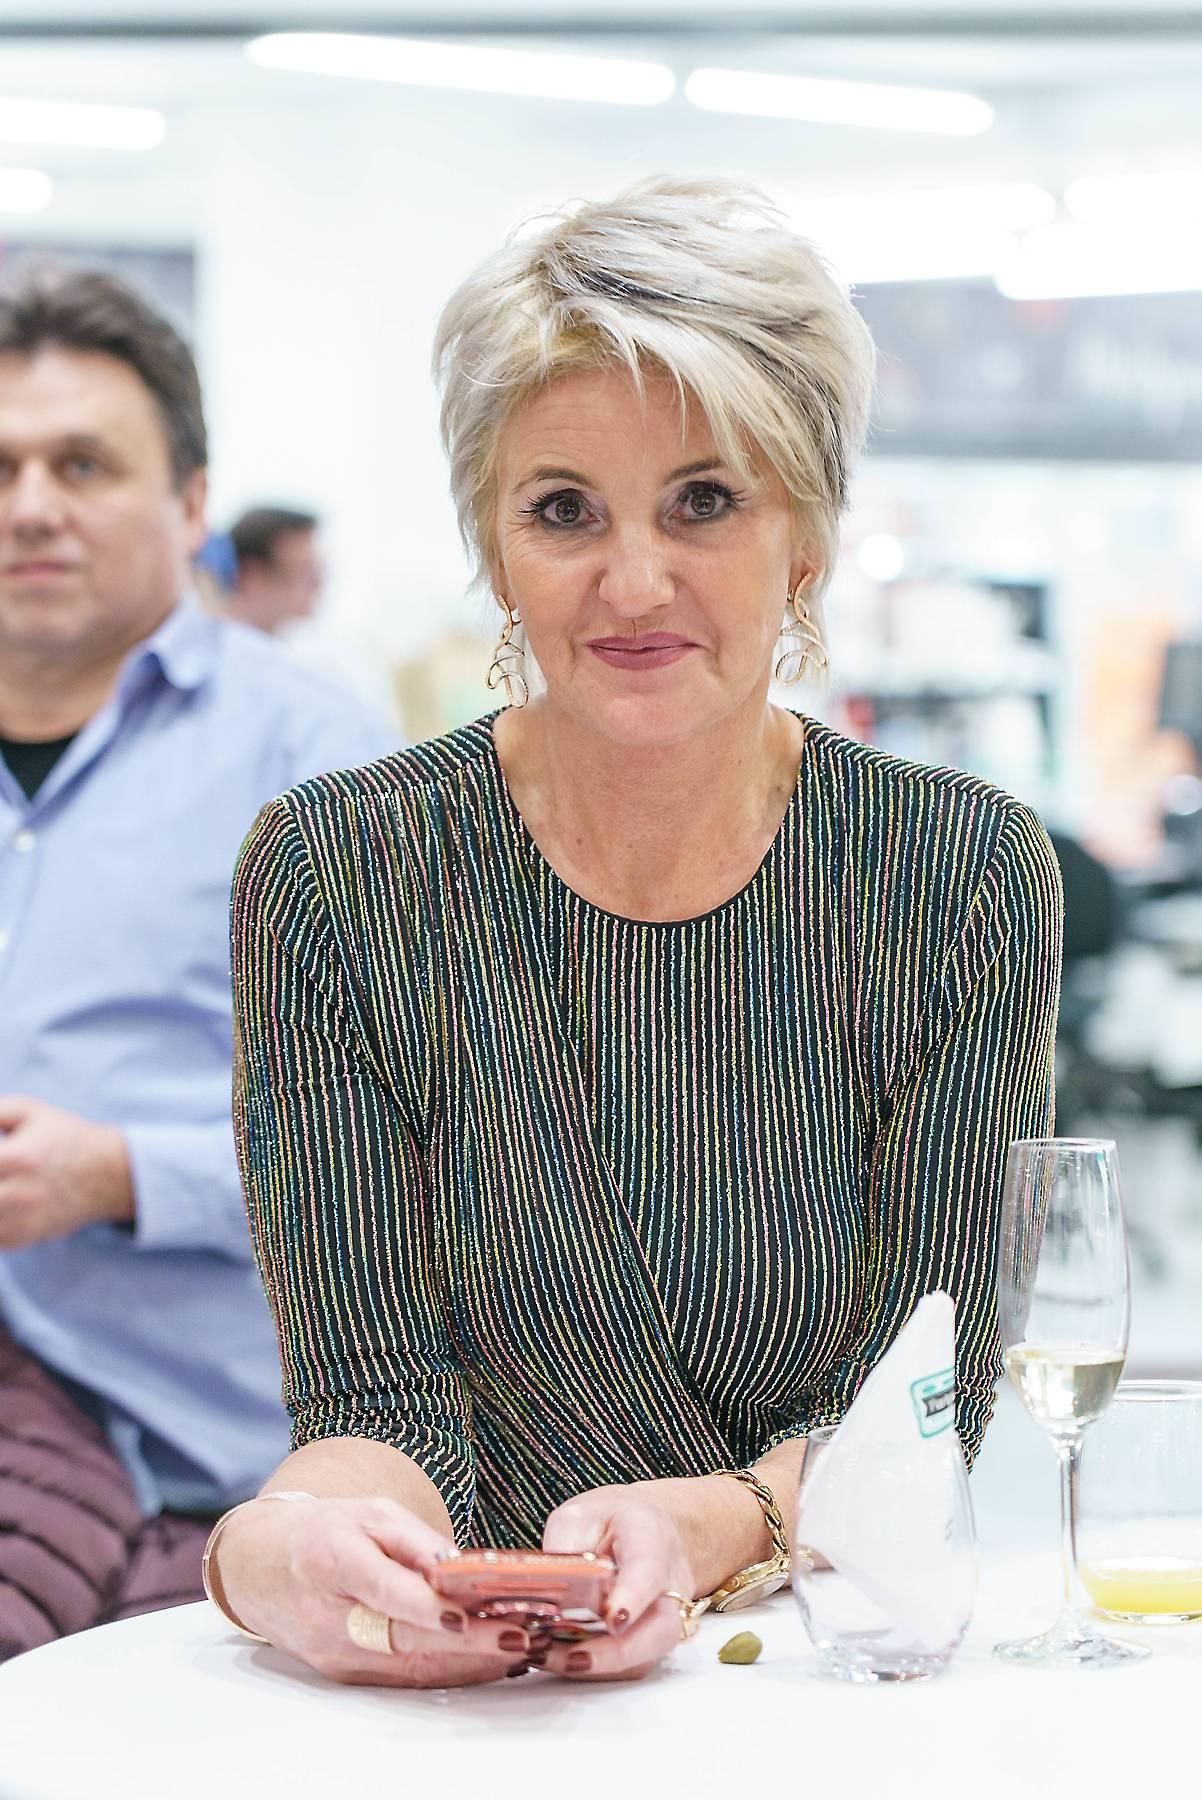 Karin Karrer